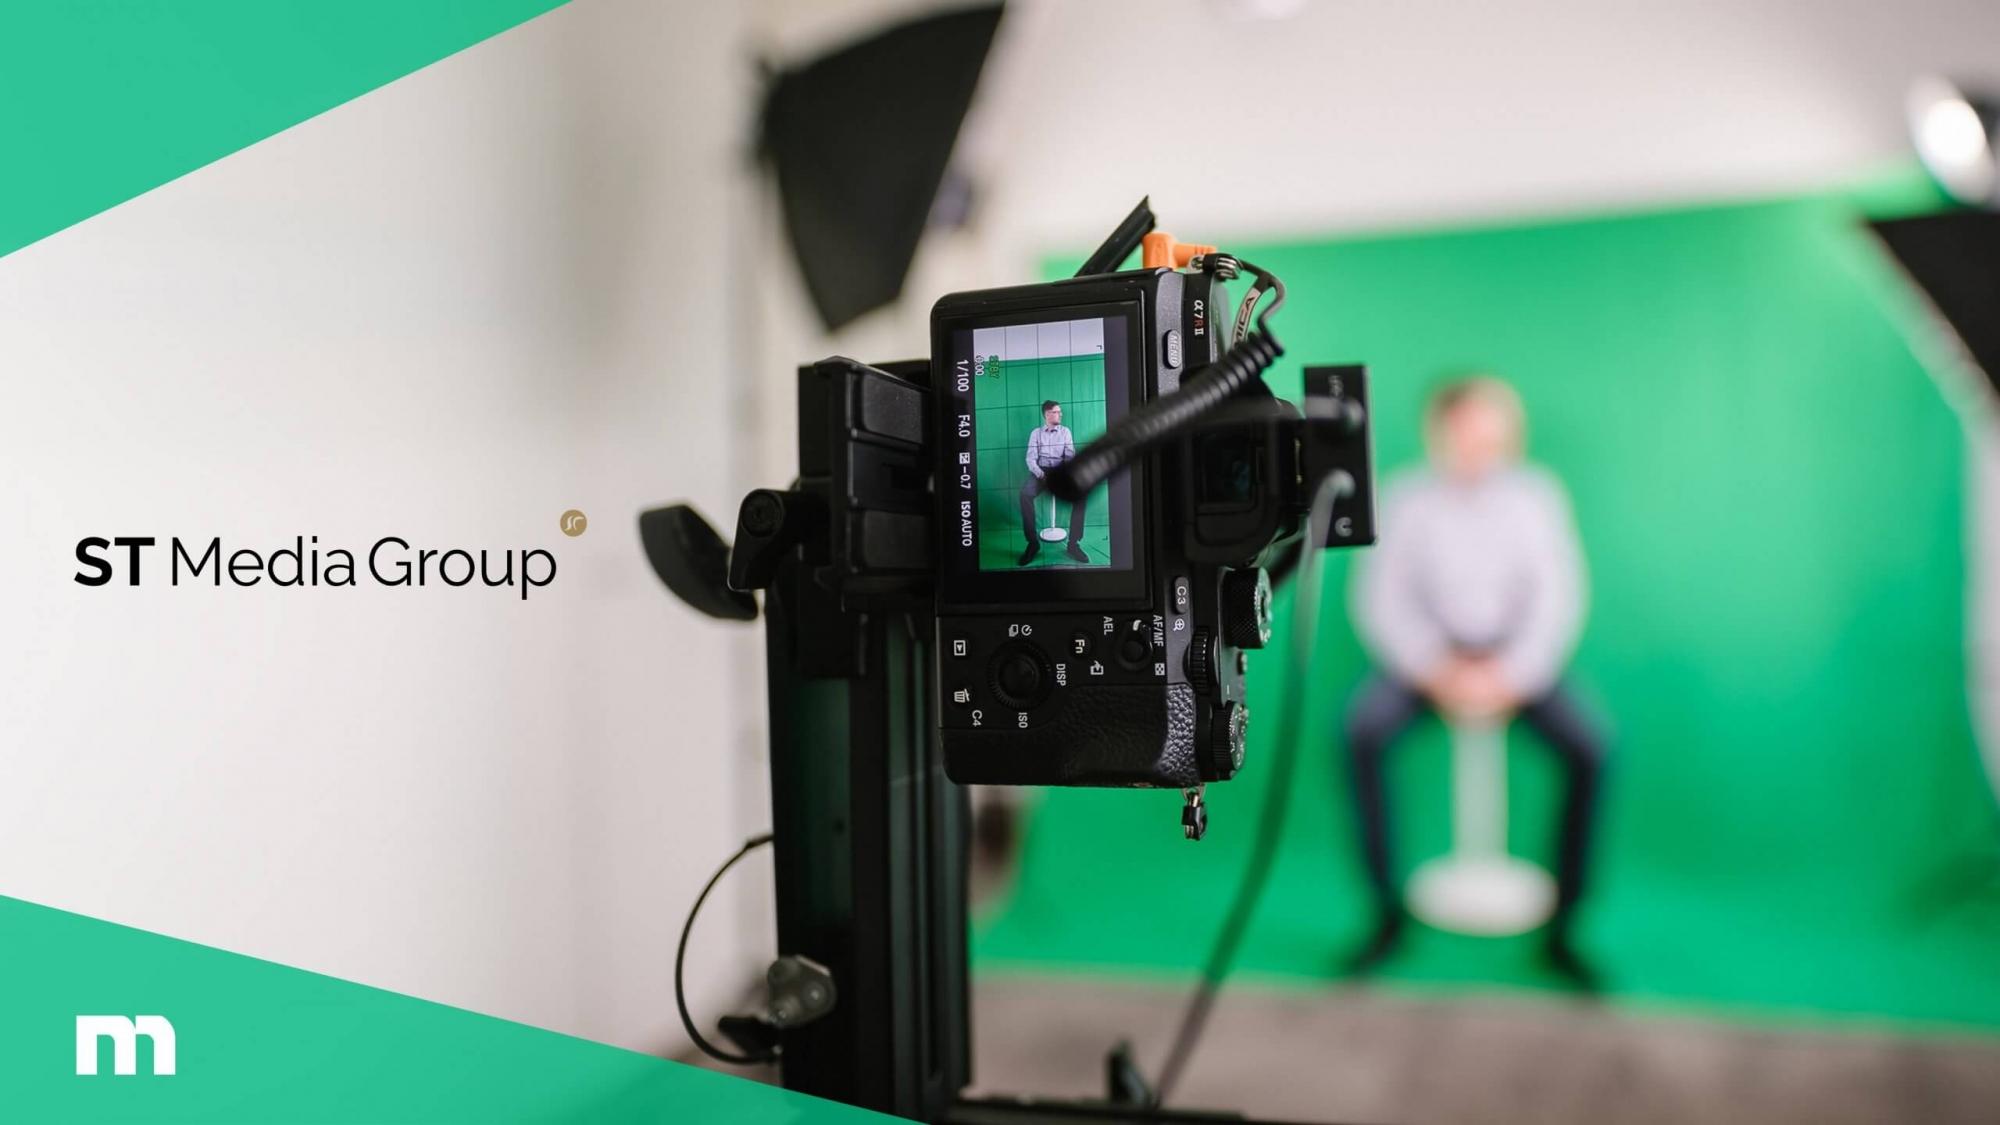 Medat Laborinformationssystem, ST Media Group, Fotoshooting